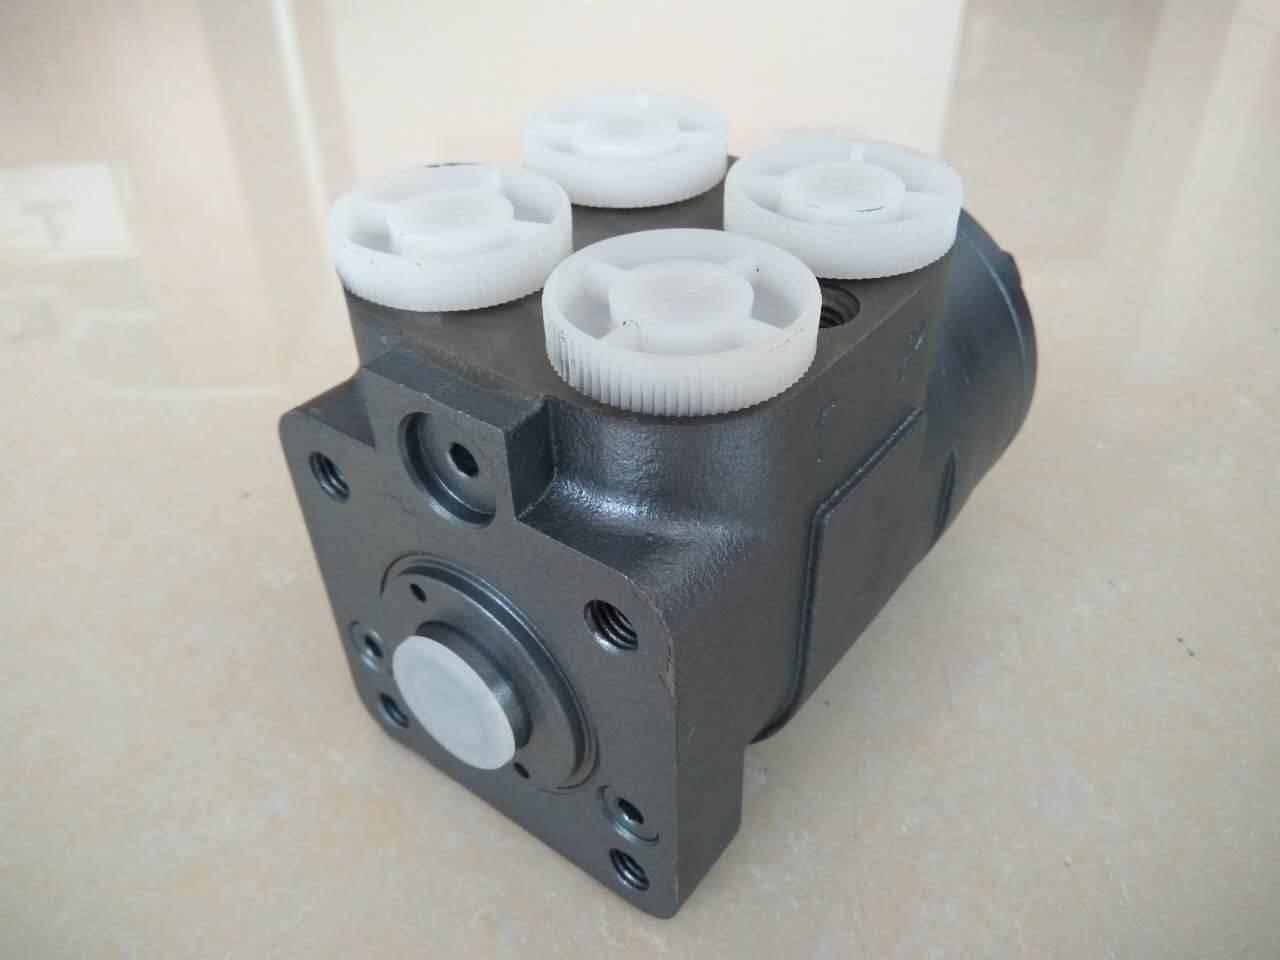 power steering unit replacement of Danfoss